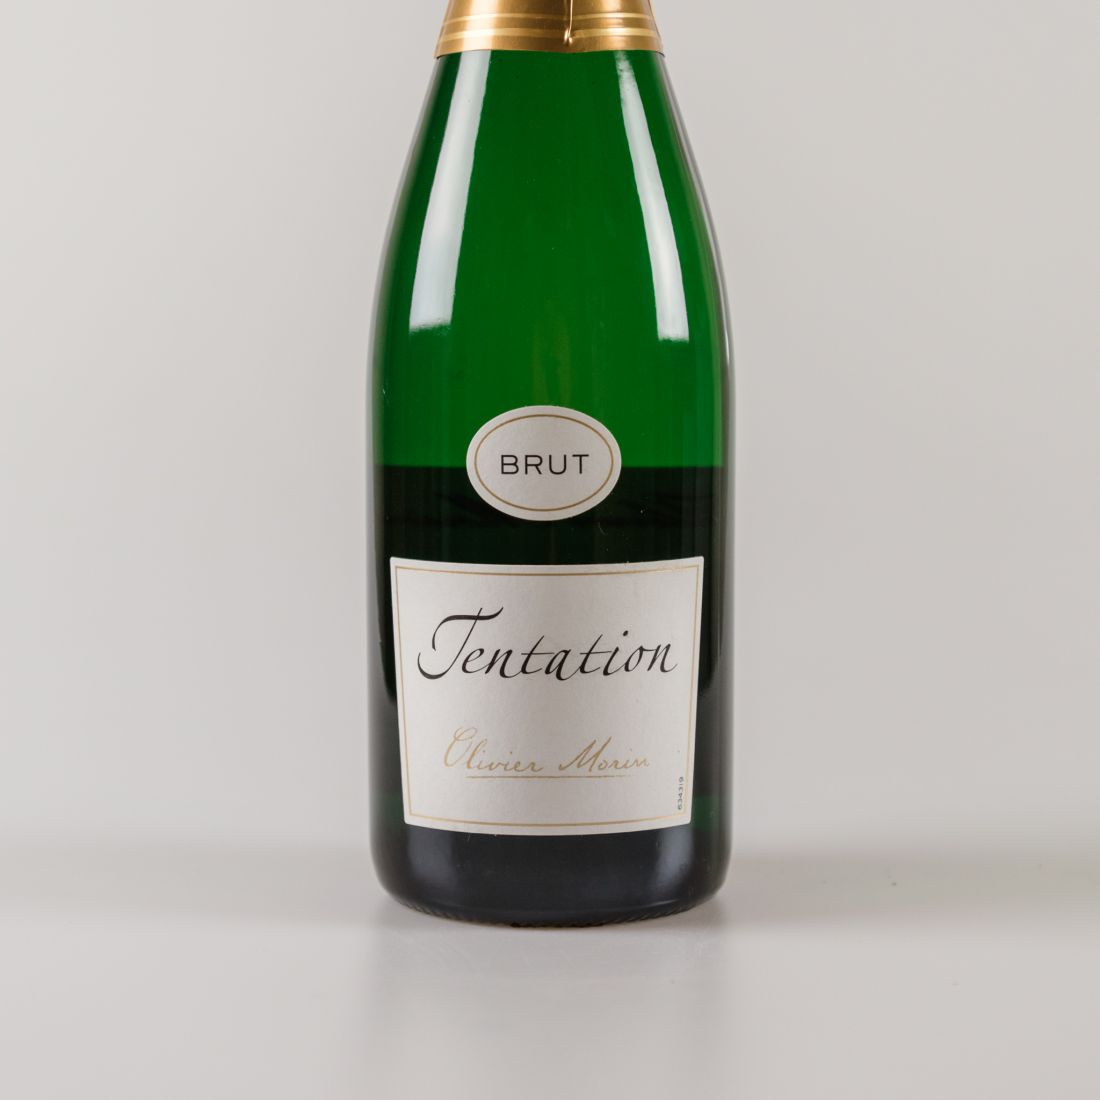 crmant de bourgogne tentation chardonnay